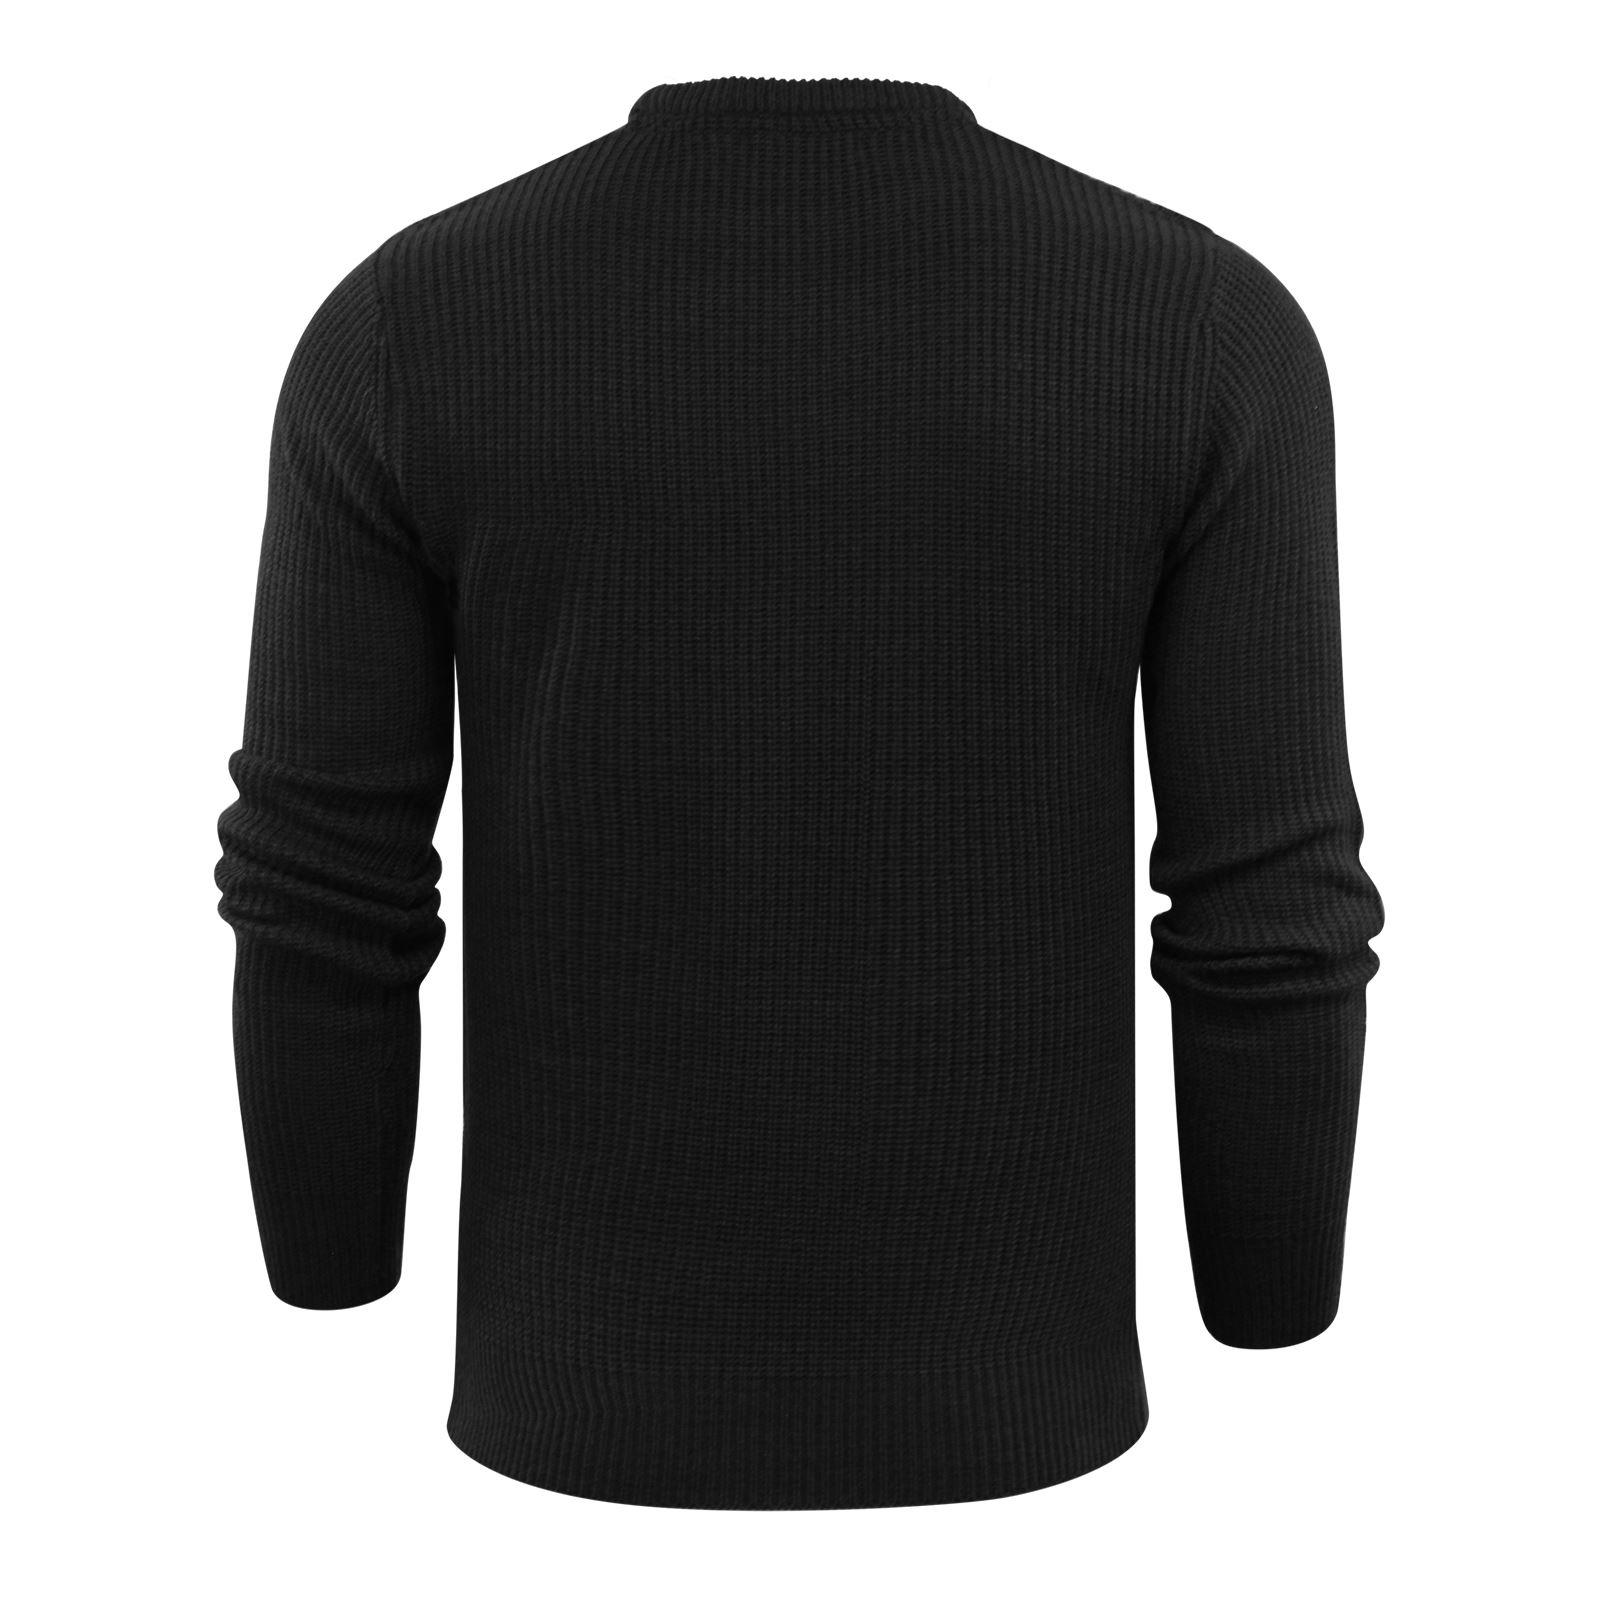 Brave-Soul-Fulton-Mens-Jumper-Kintted-Crew-Neck-Sweater thumbnail 7